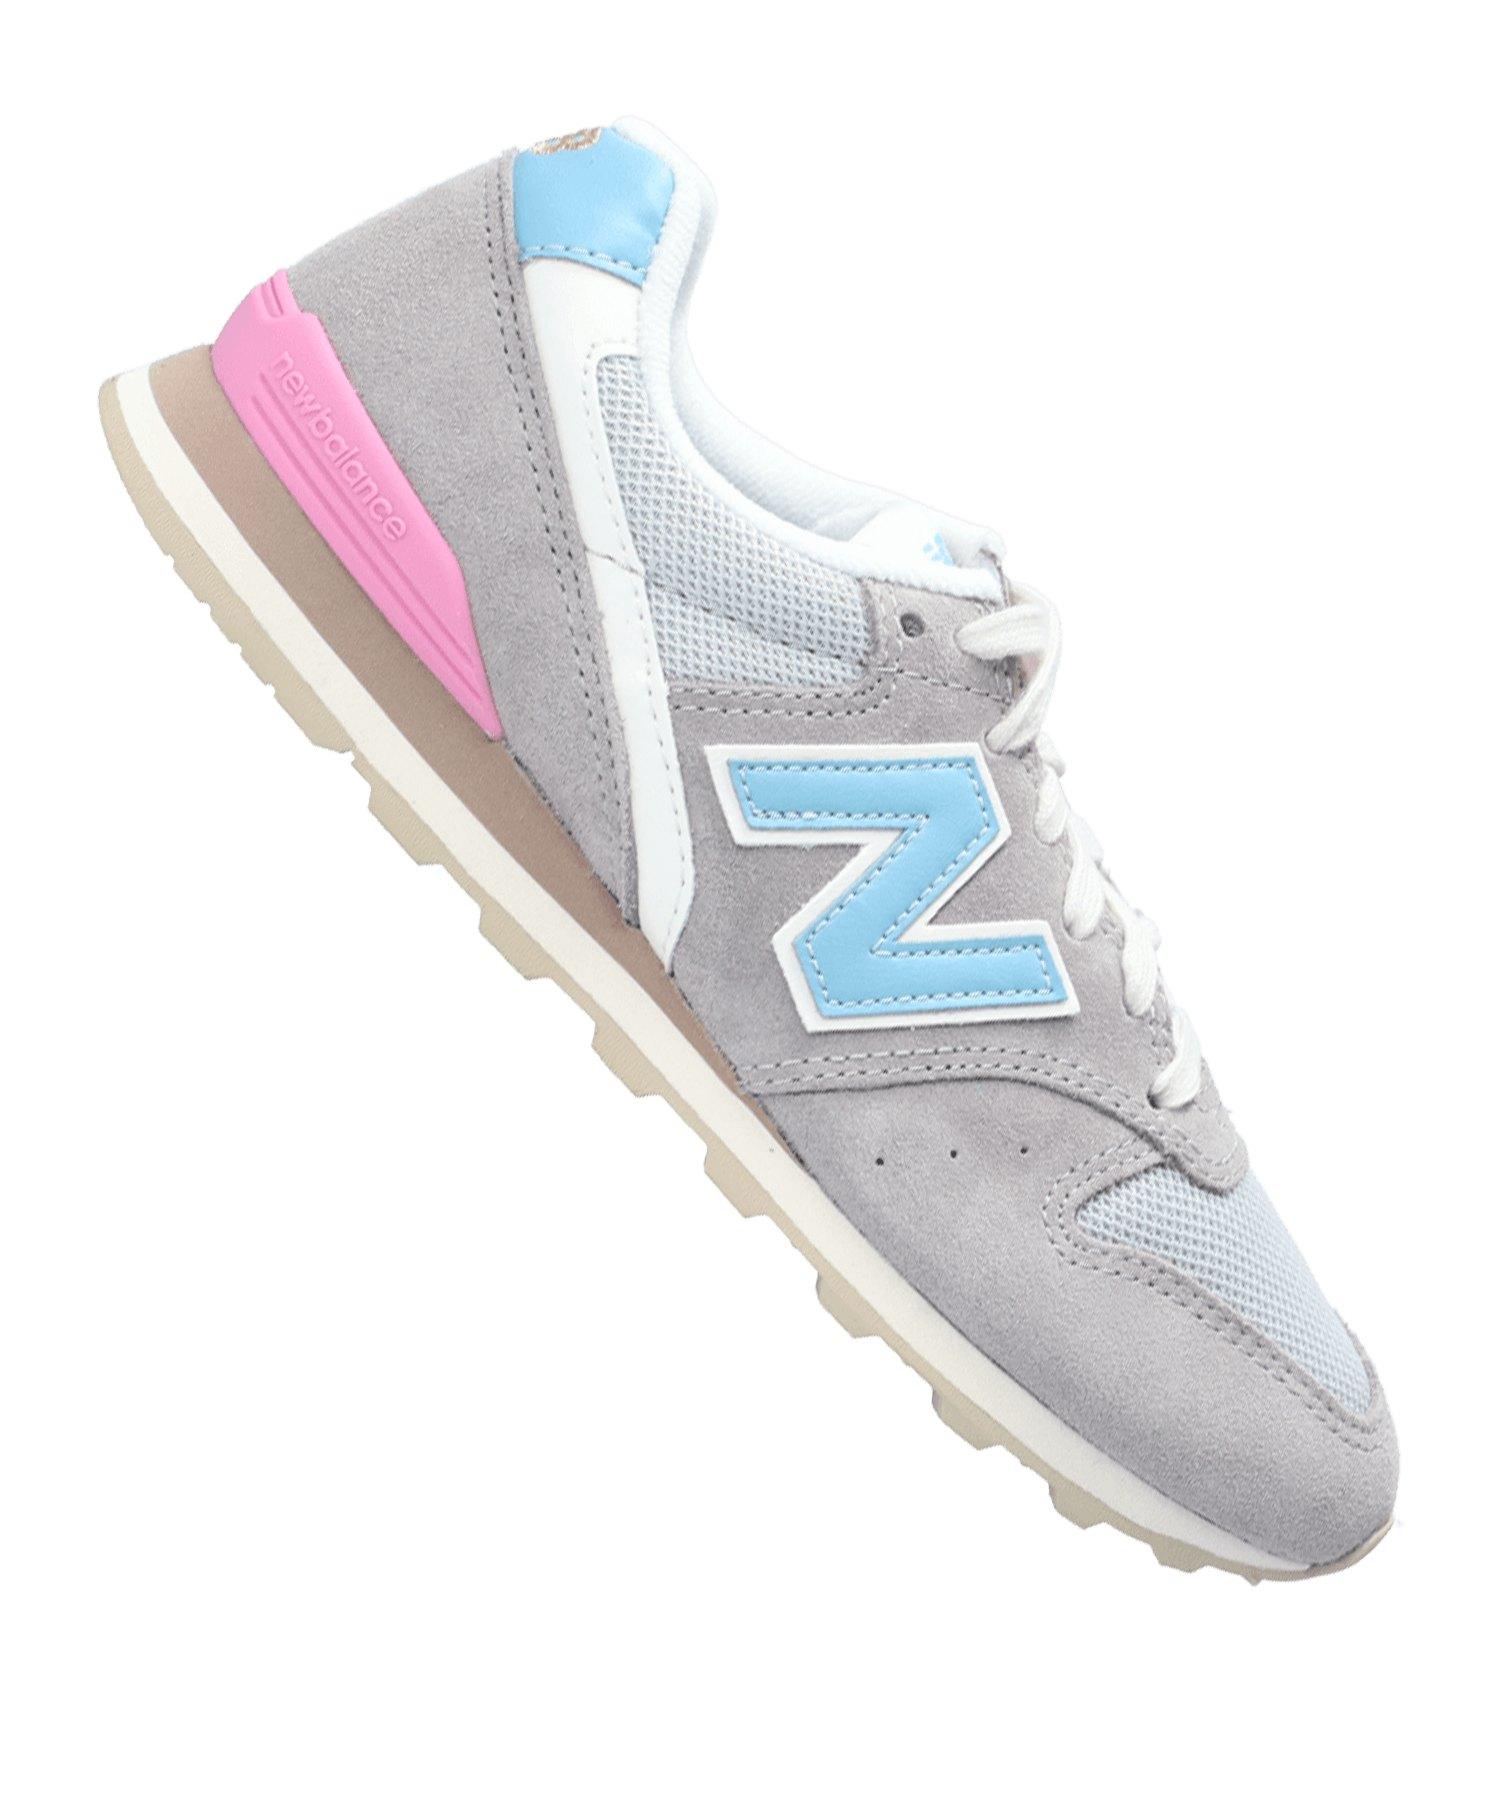 New Balance WL996 B Sneaker Damen Grau F12 - grau